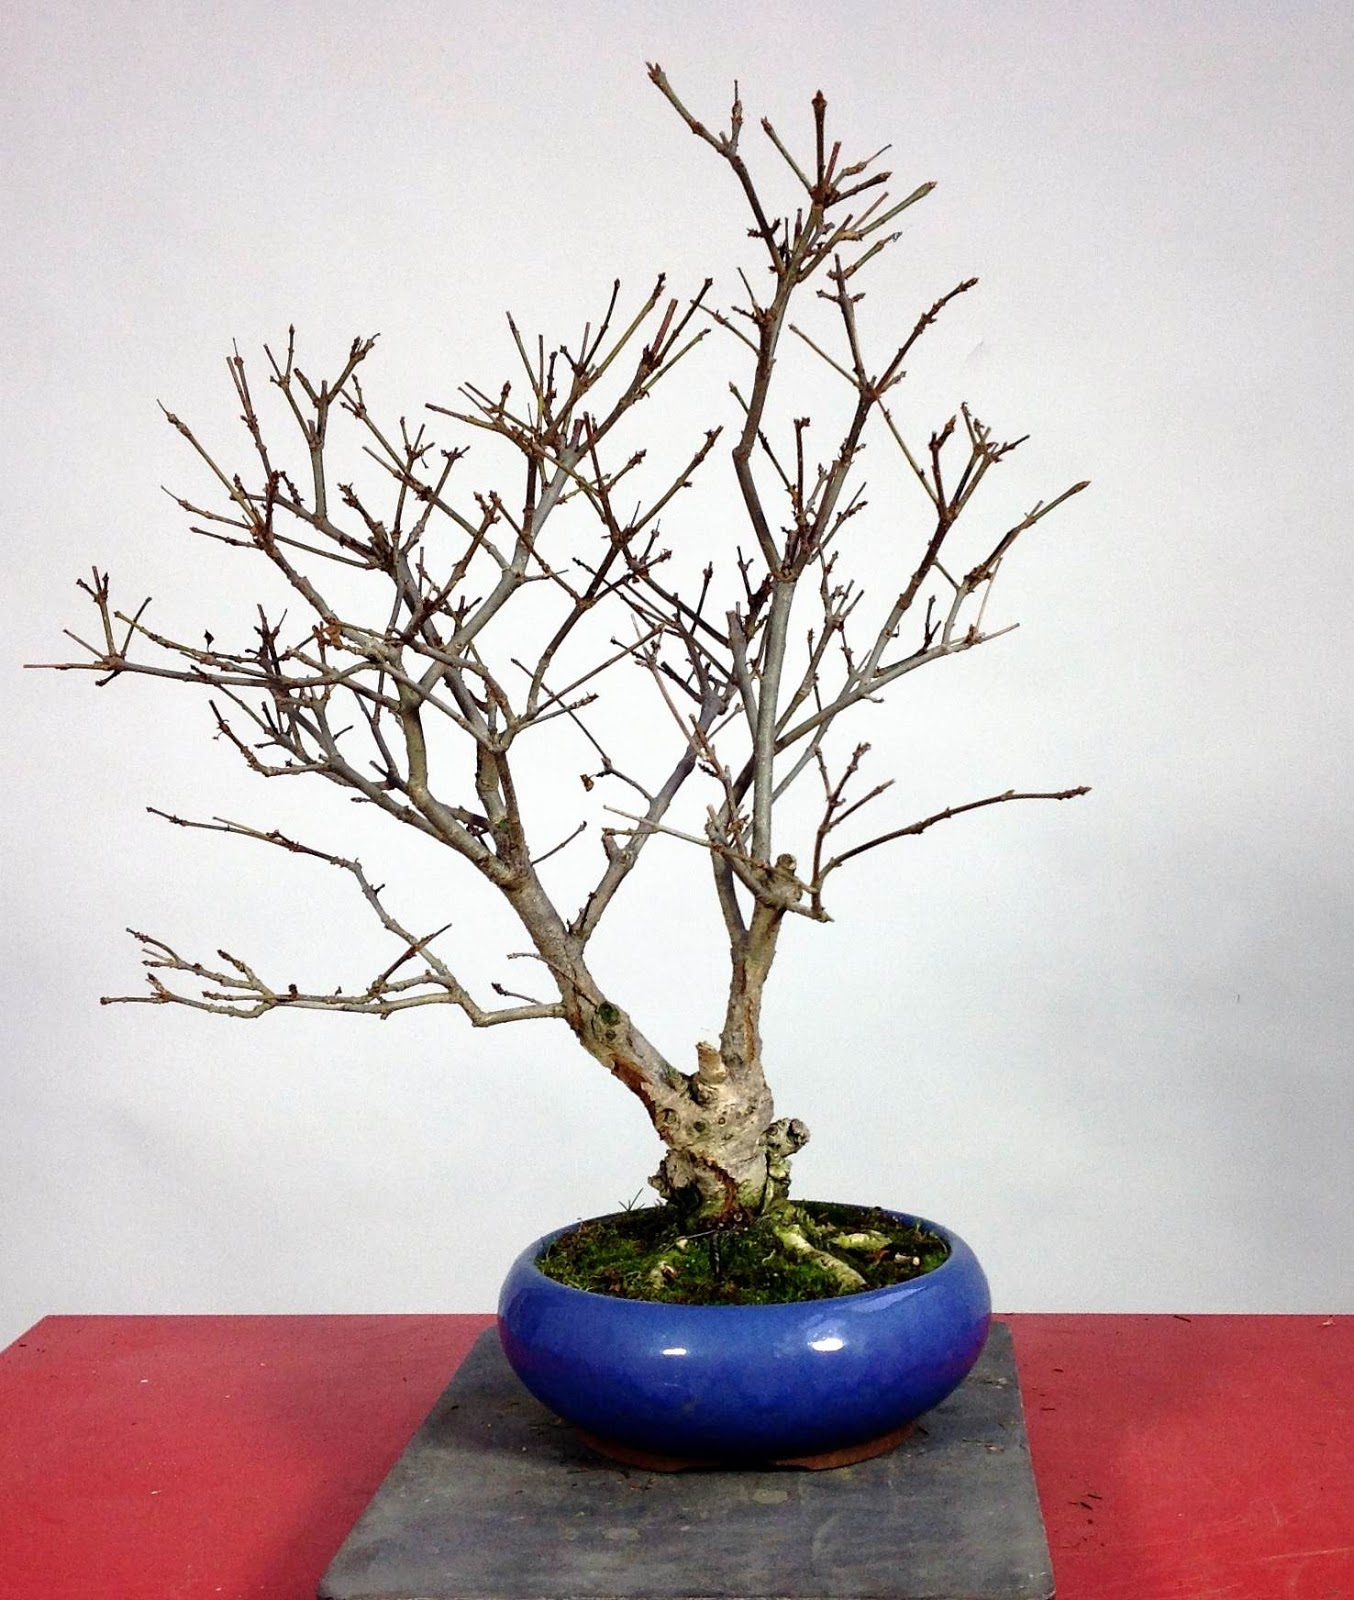 Saruyama Blog February 2013